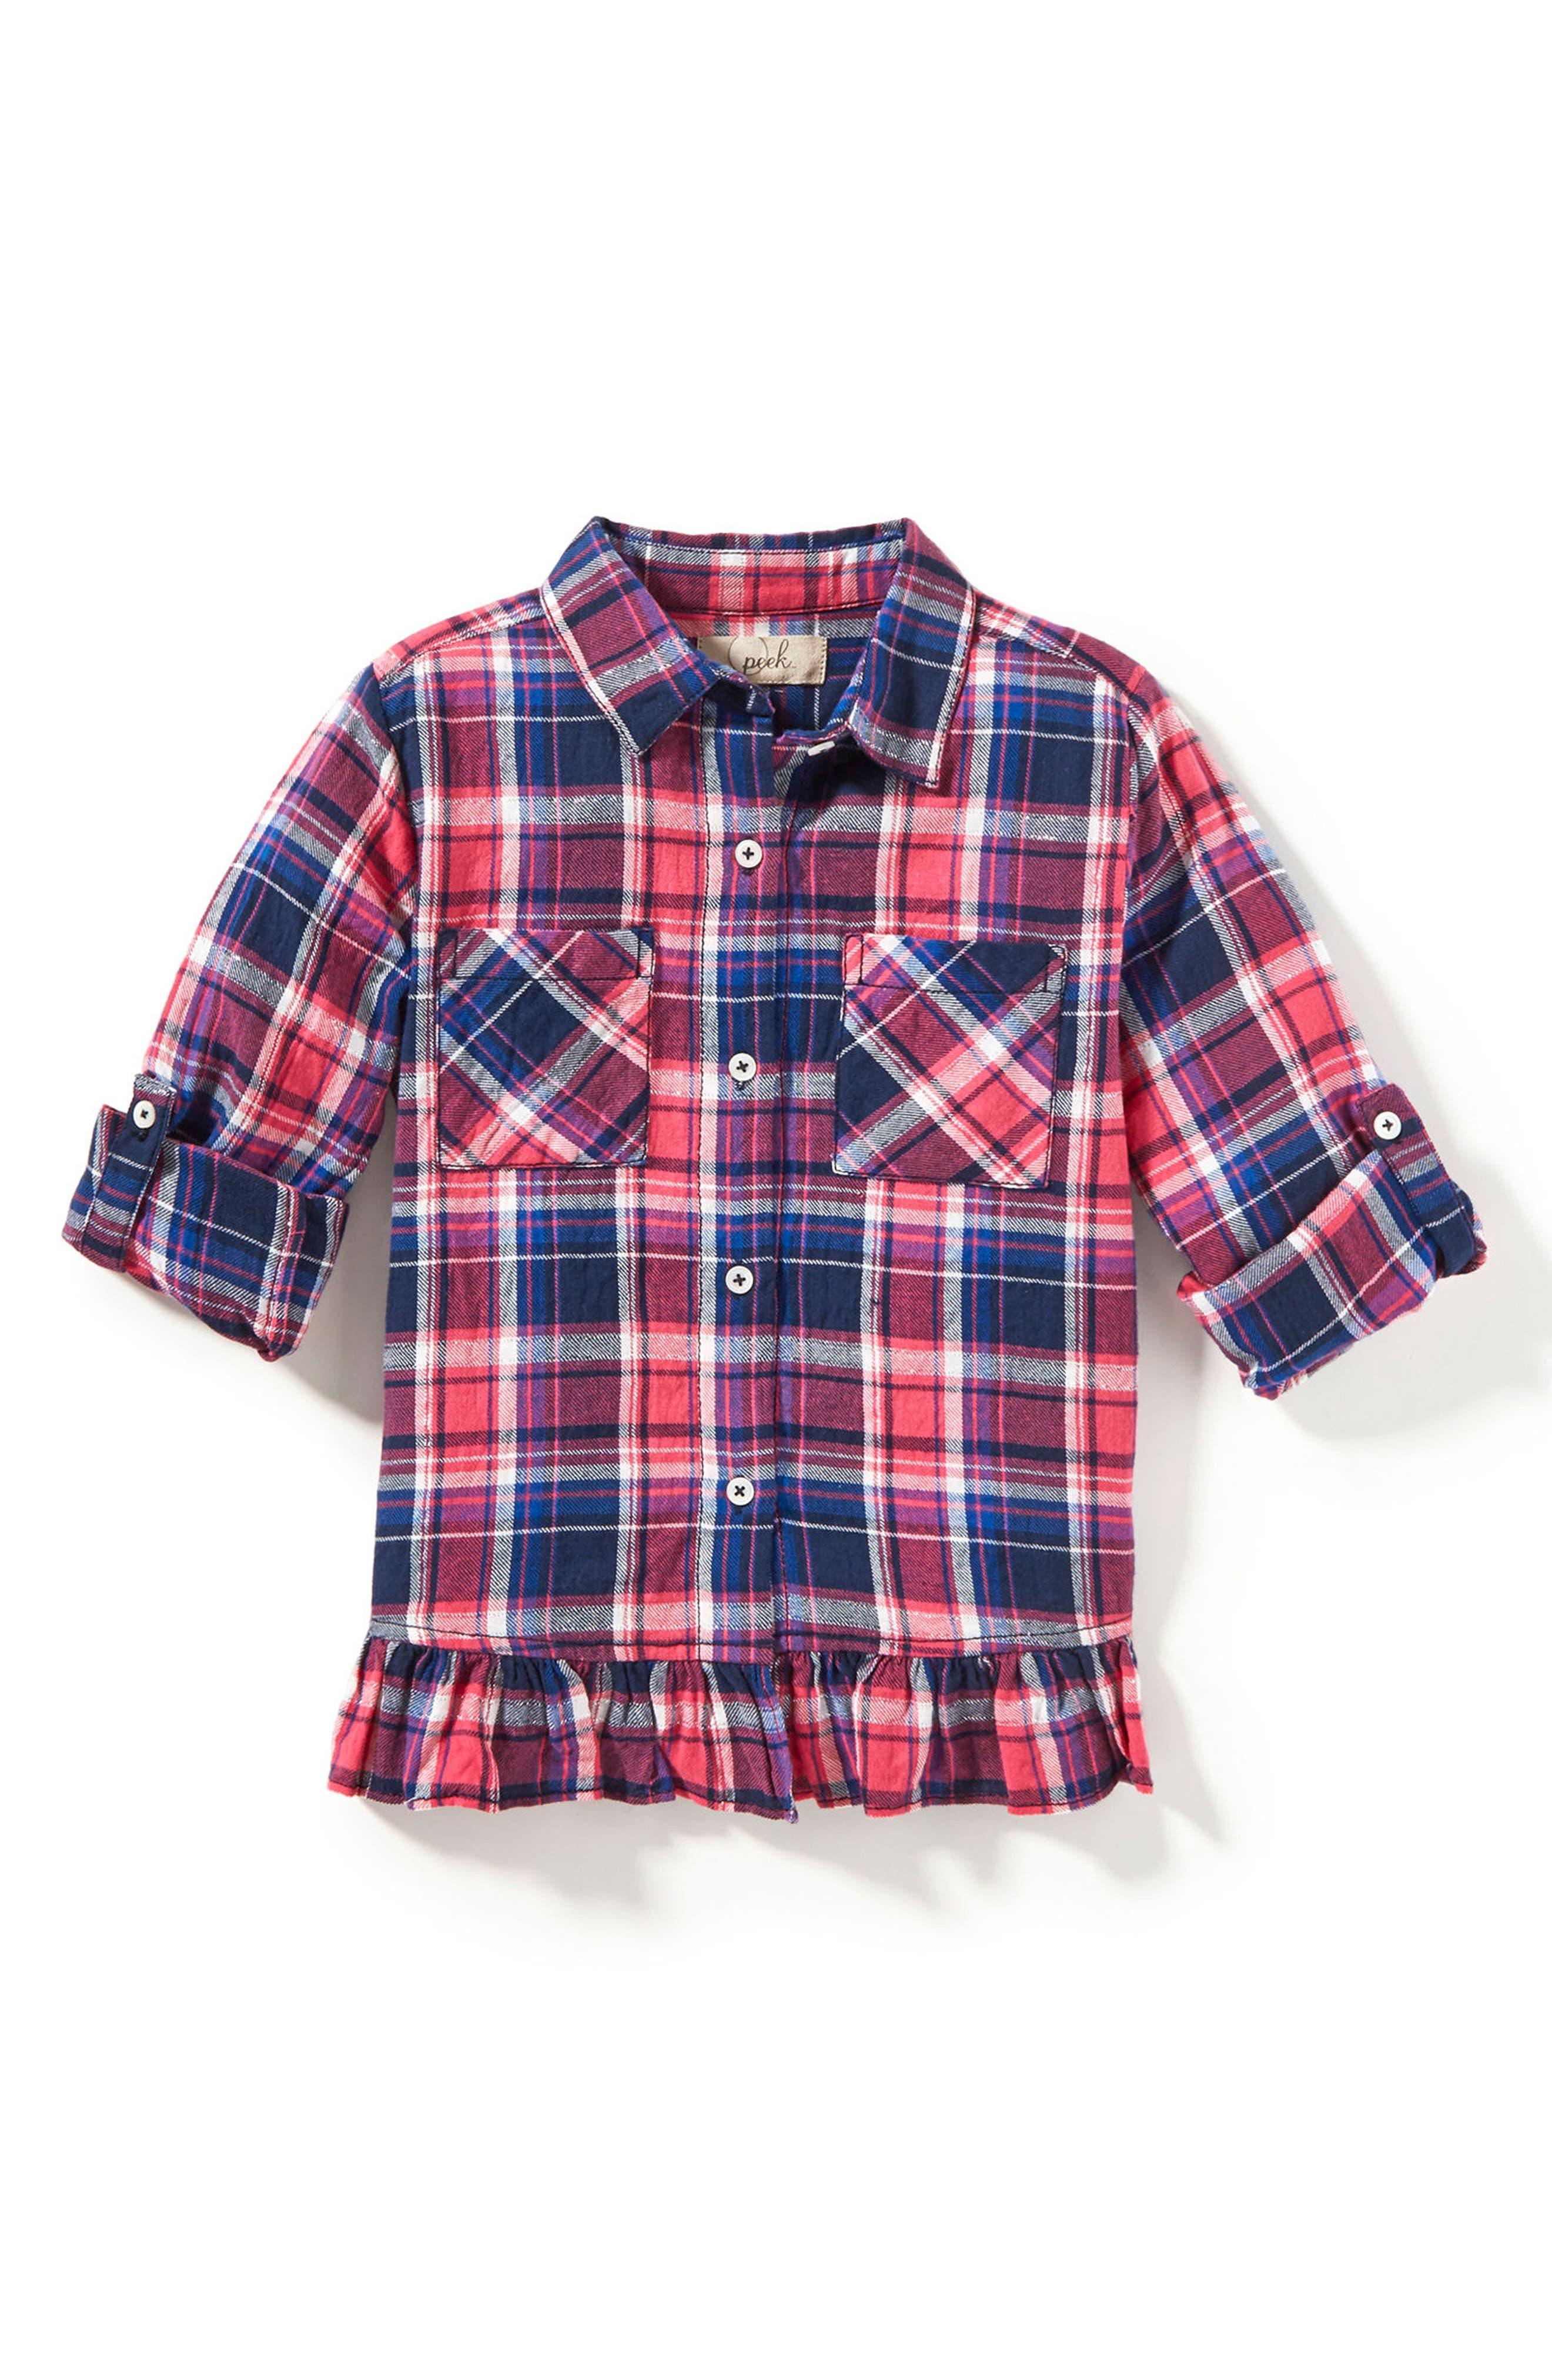 Alternate Image 1 Selected - Peek Maggie Ruffle Hem Plaid Shirt (Toddler Girls, Little Girls & Big Girls)